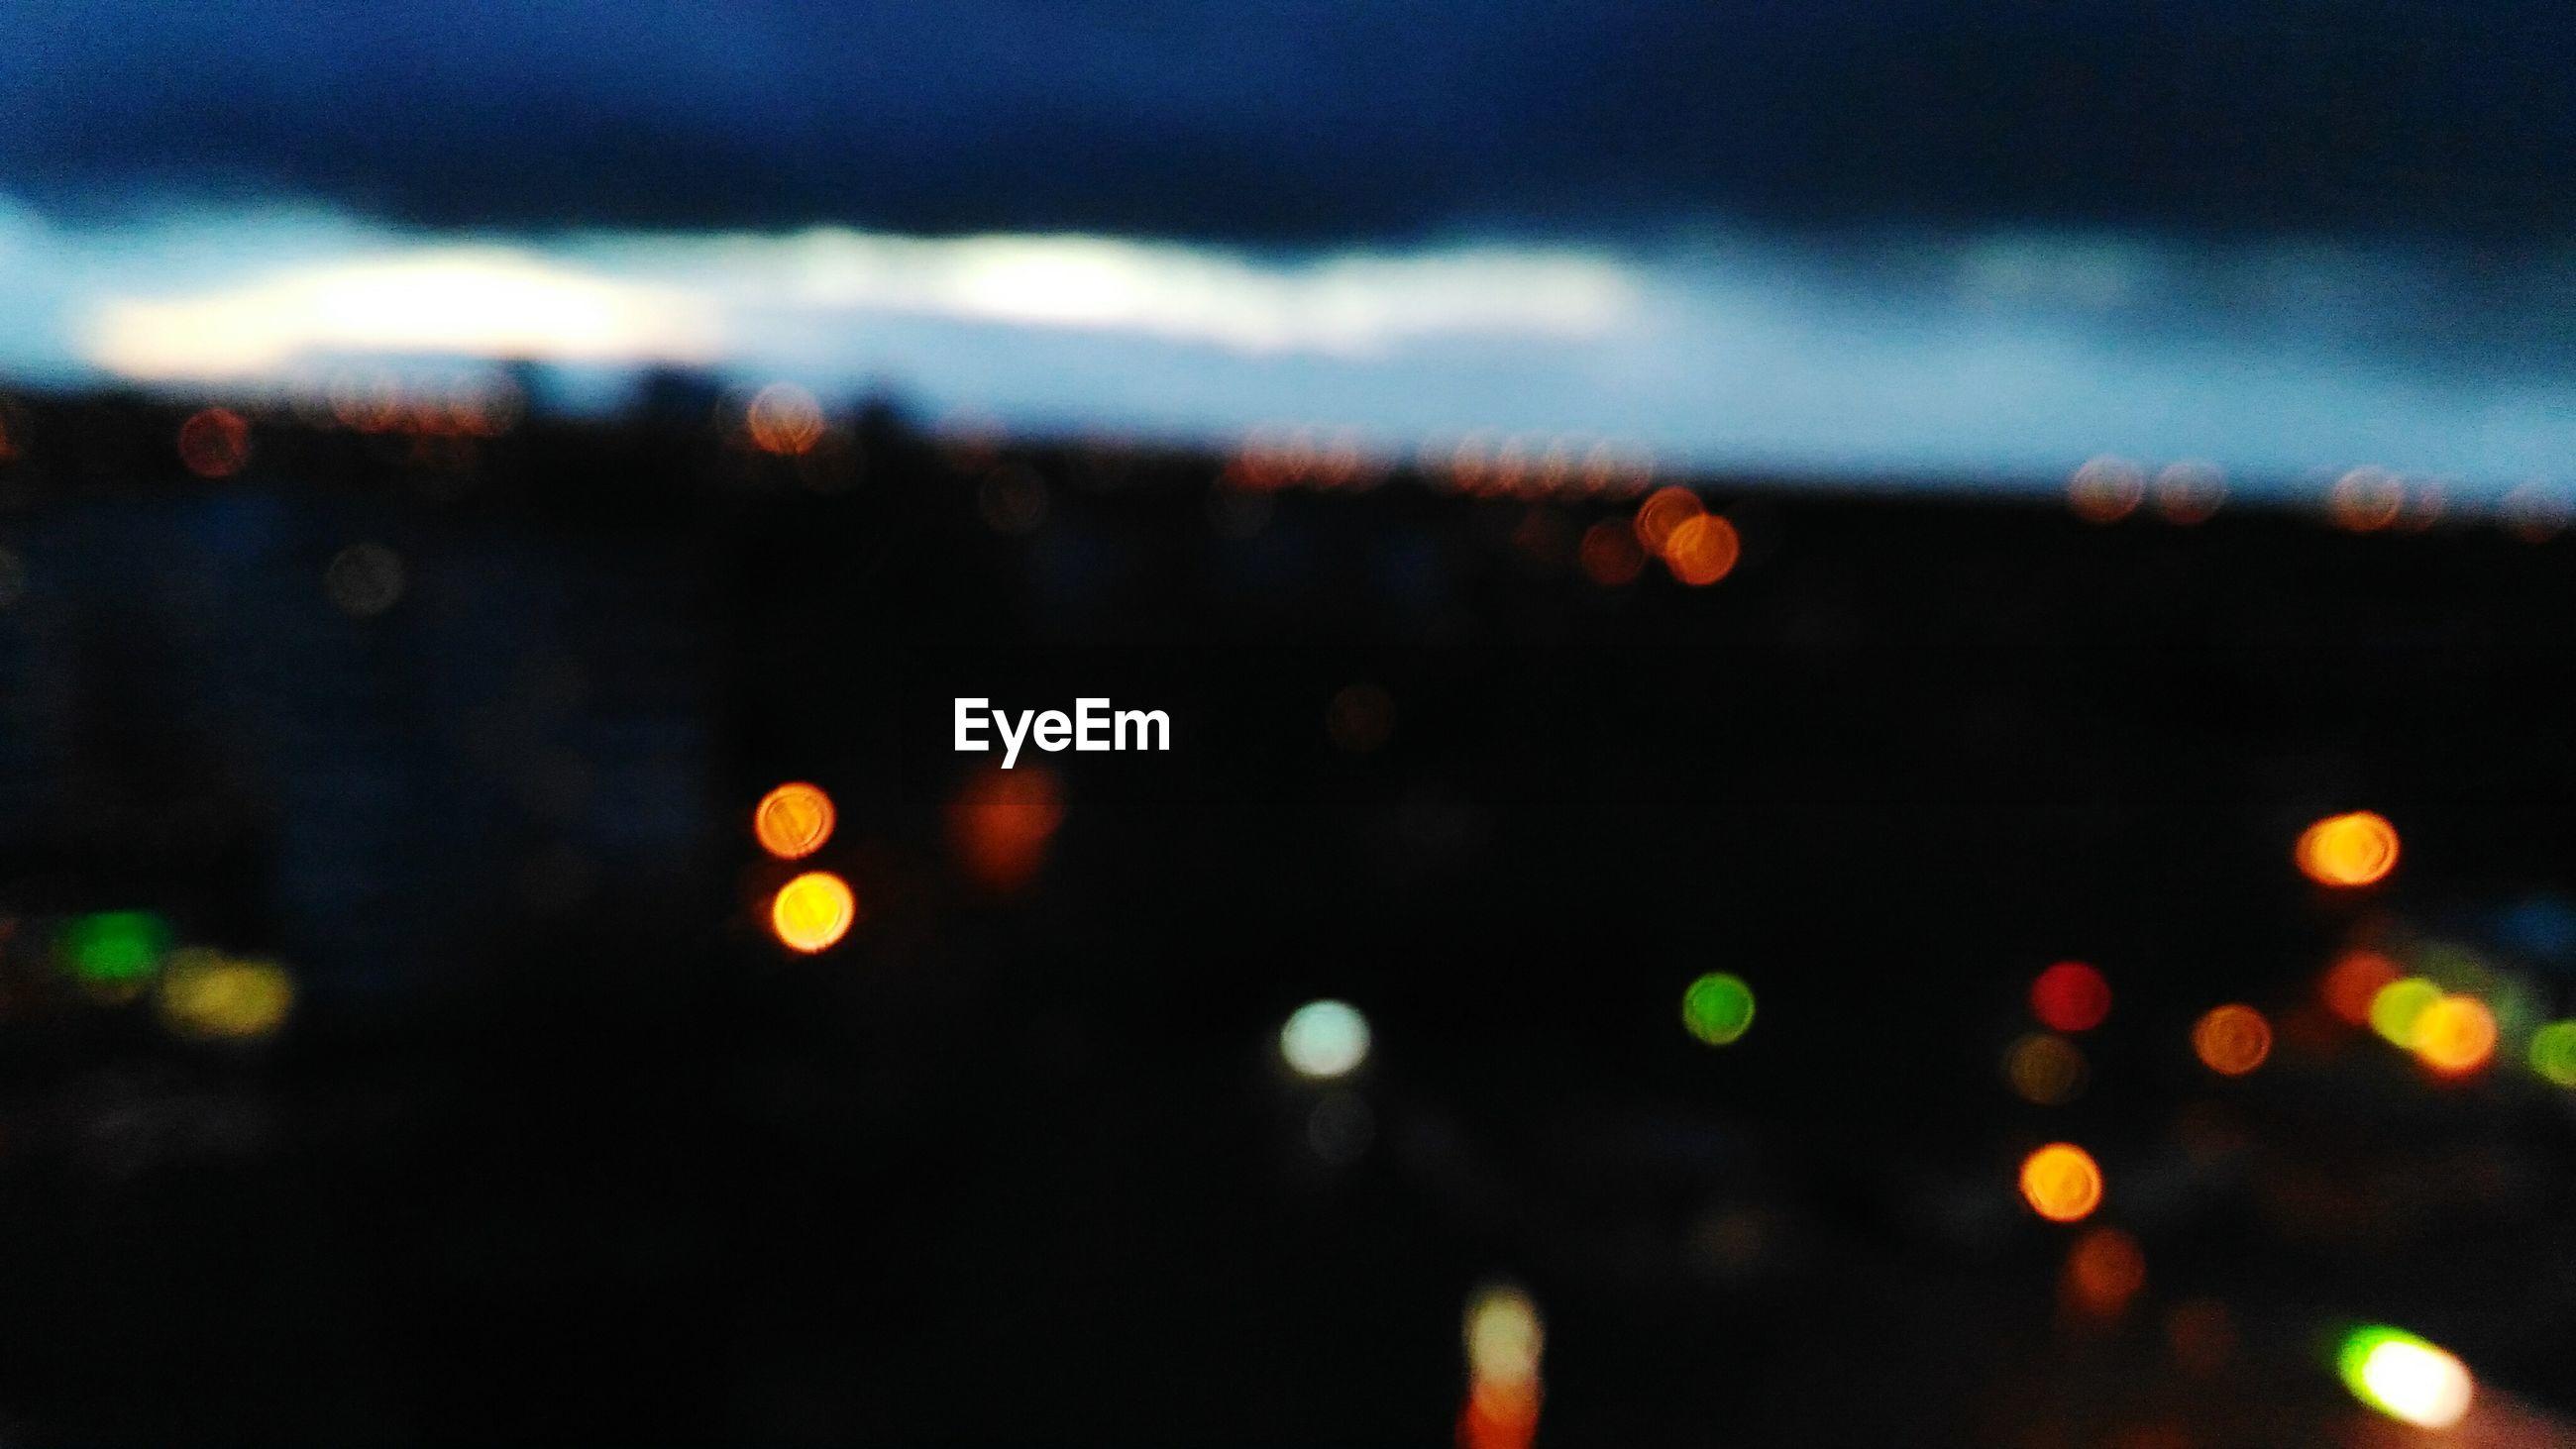 illuminated, defocused, night, city, no people, close-up, sky, rainy season, backgrounds, outdoors, nature